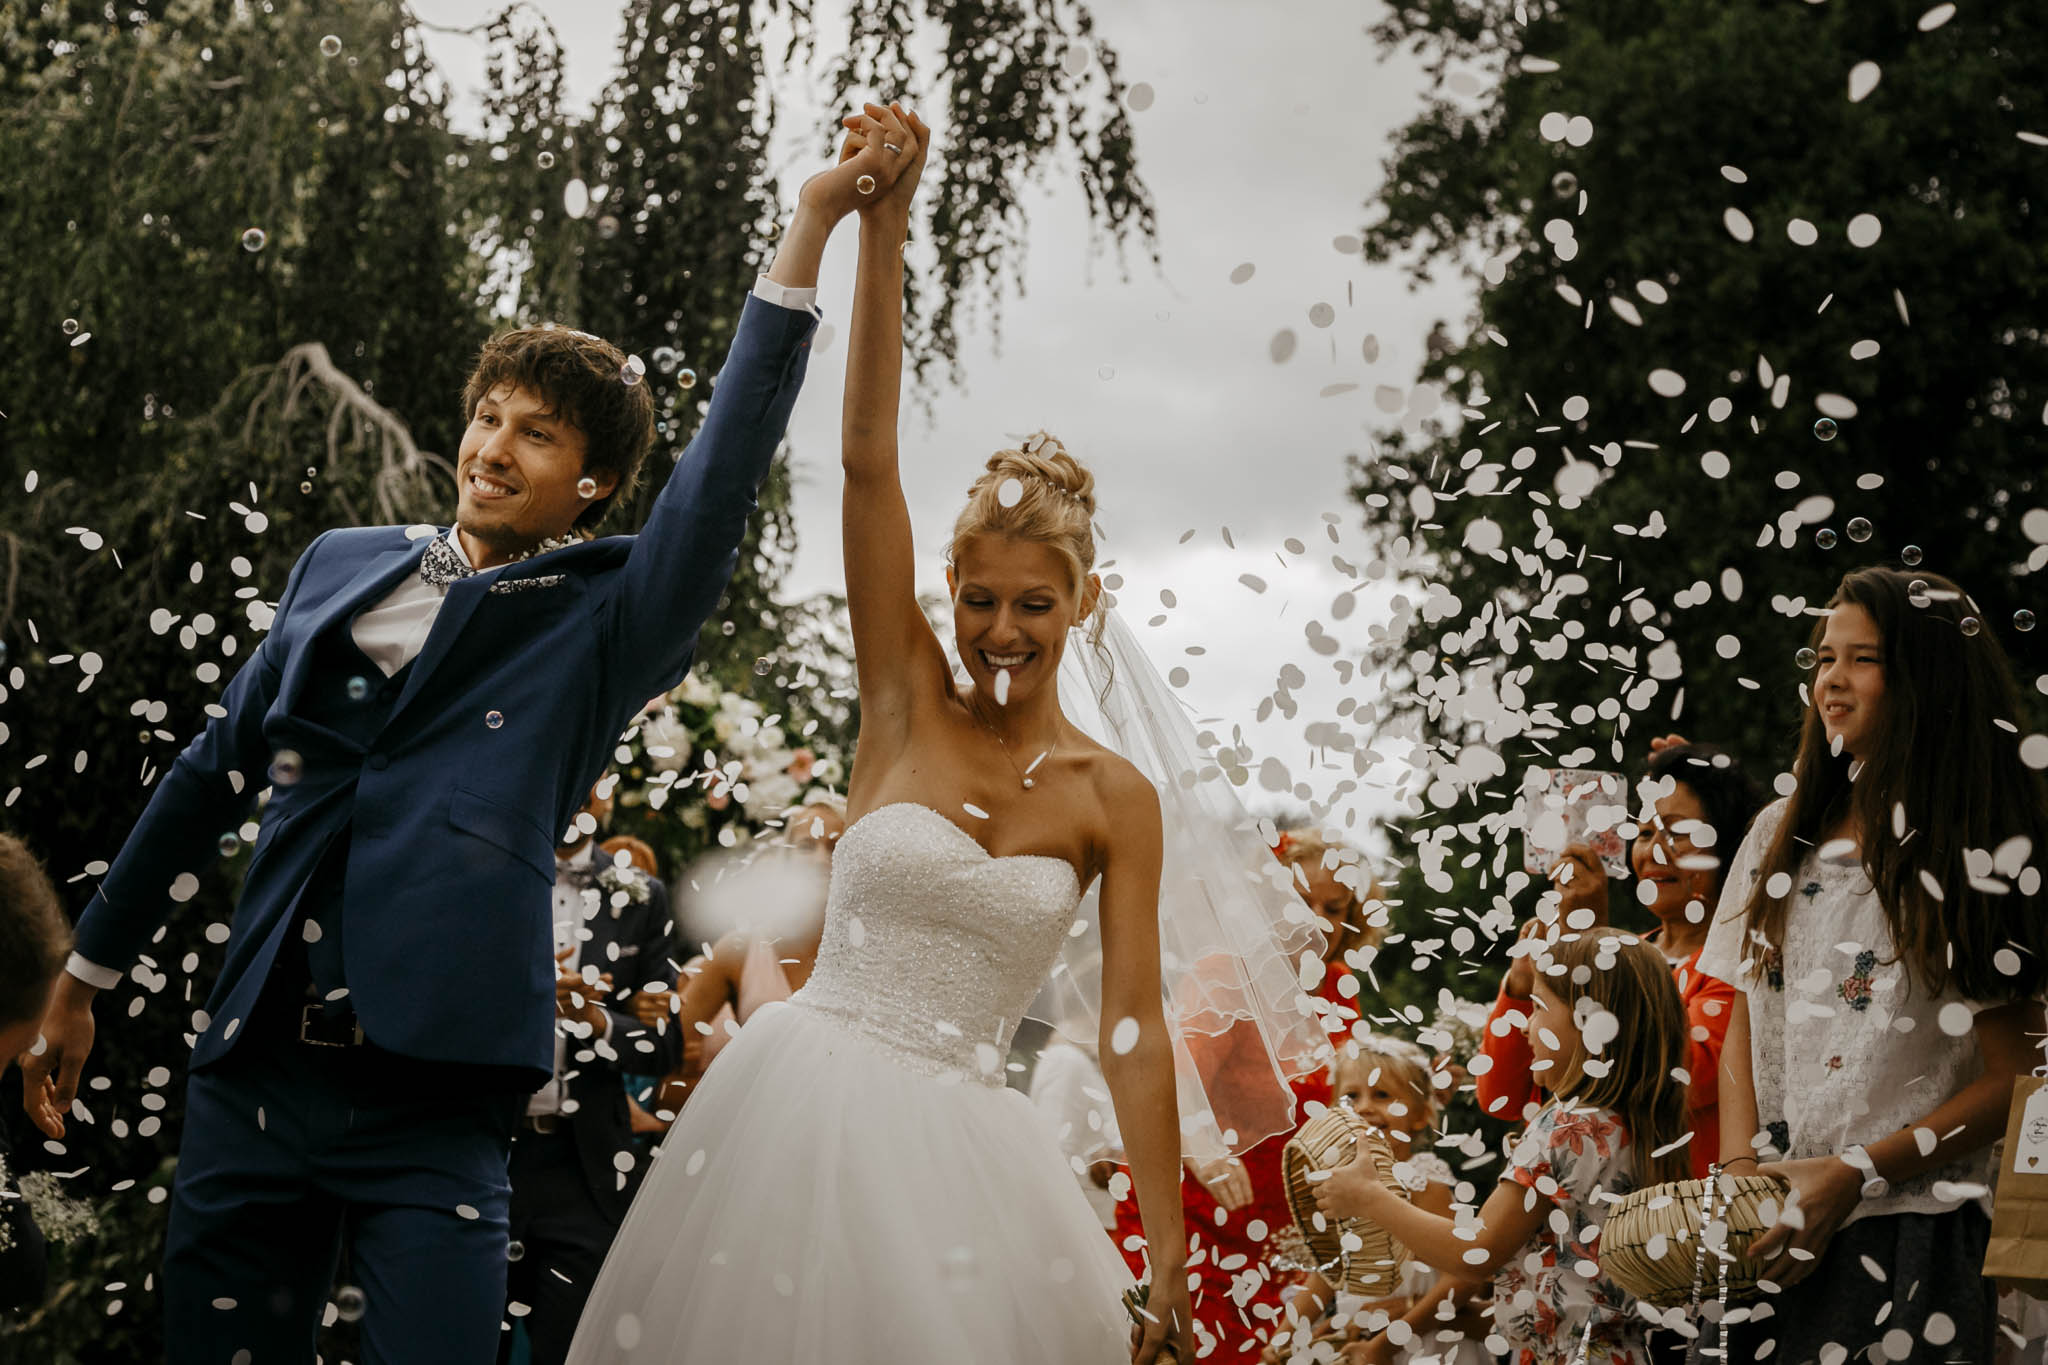 mariage-chateau-gaudras-ingold-56.jpg